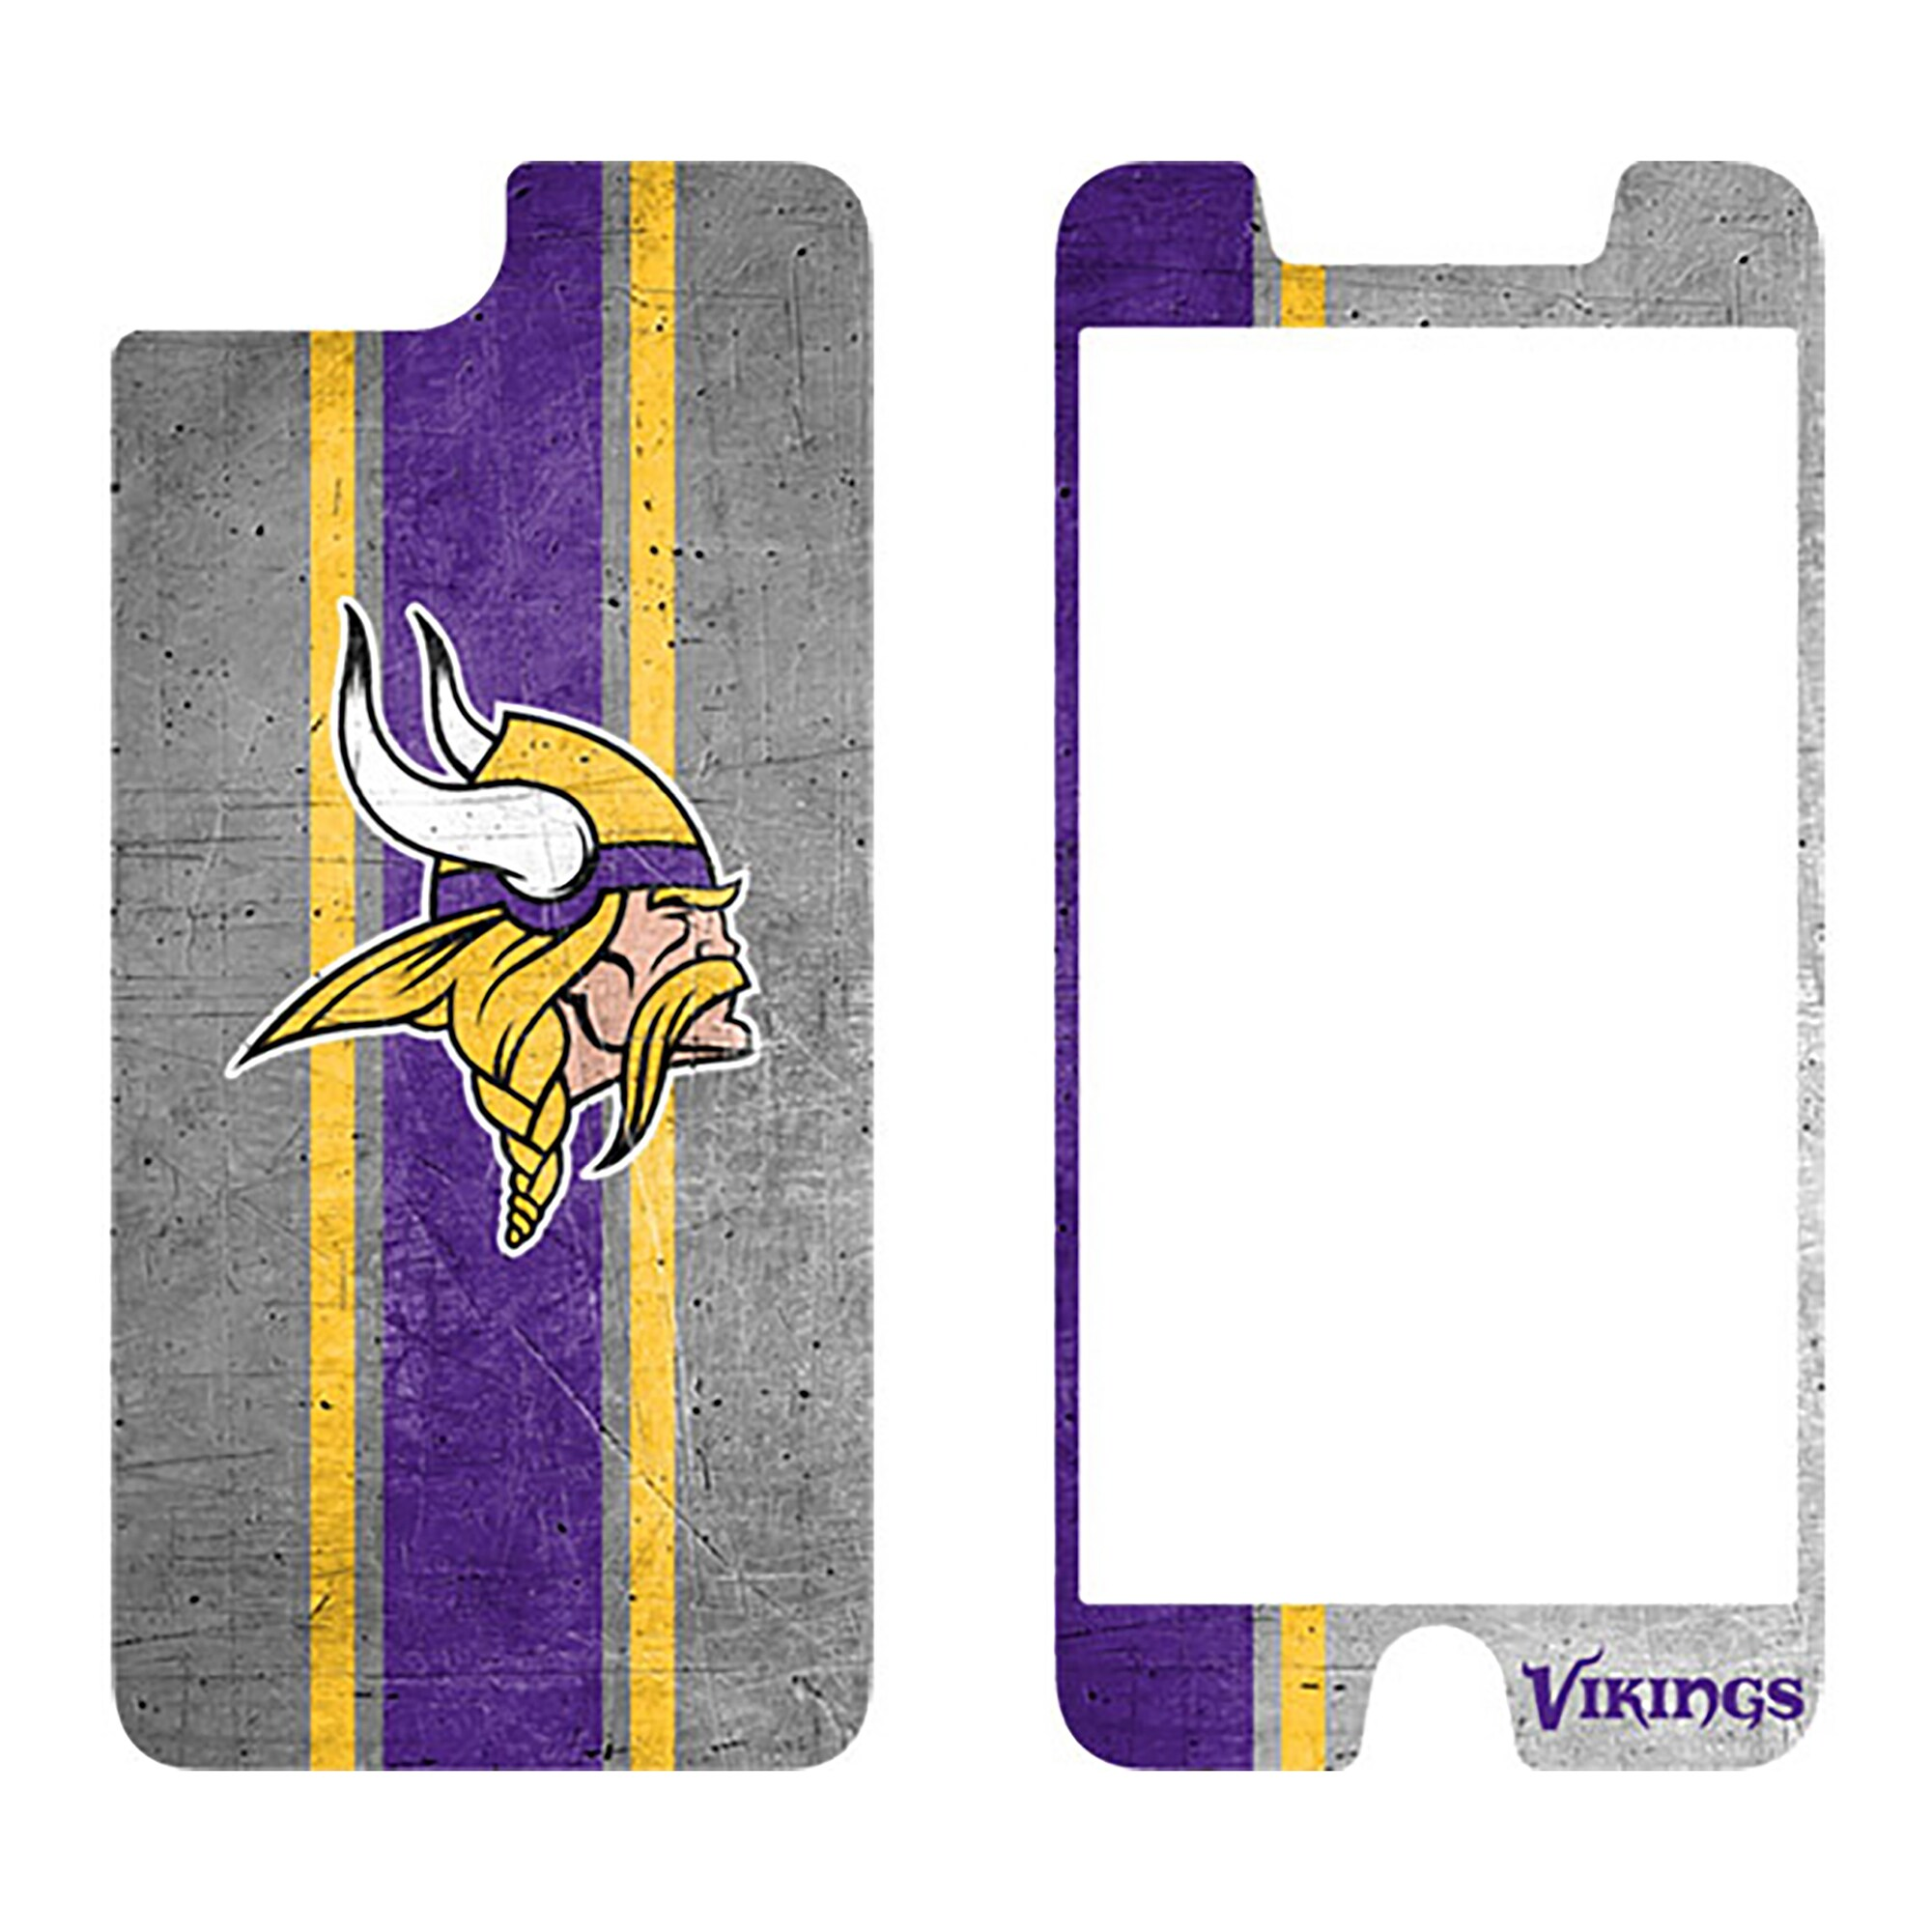 Minnesota Vikings OtterBox iPhone 8 Plus/7 Plus/6 Plus/6s Plus Alpha Glass Screen Protector